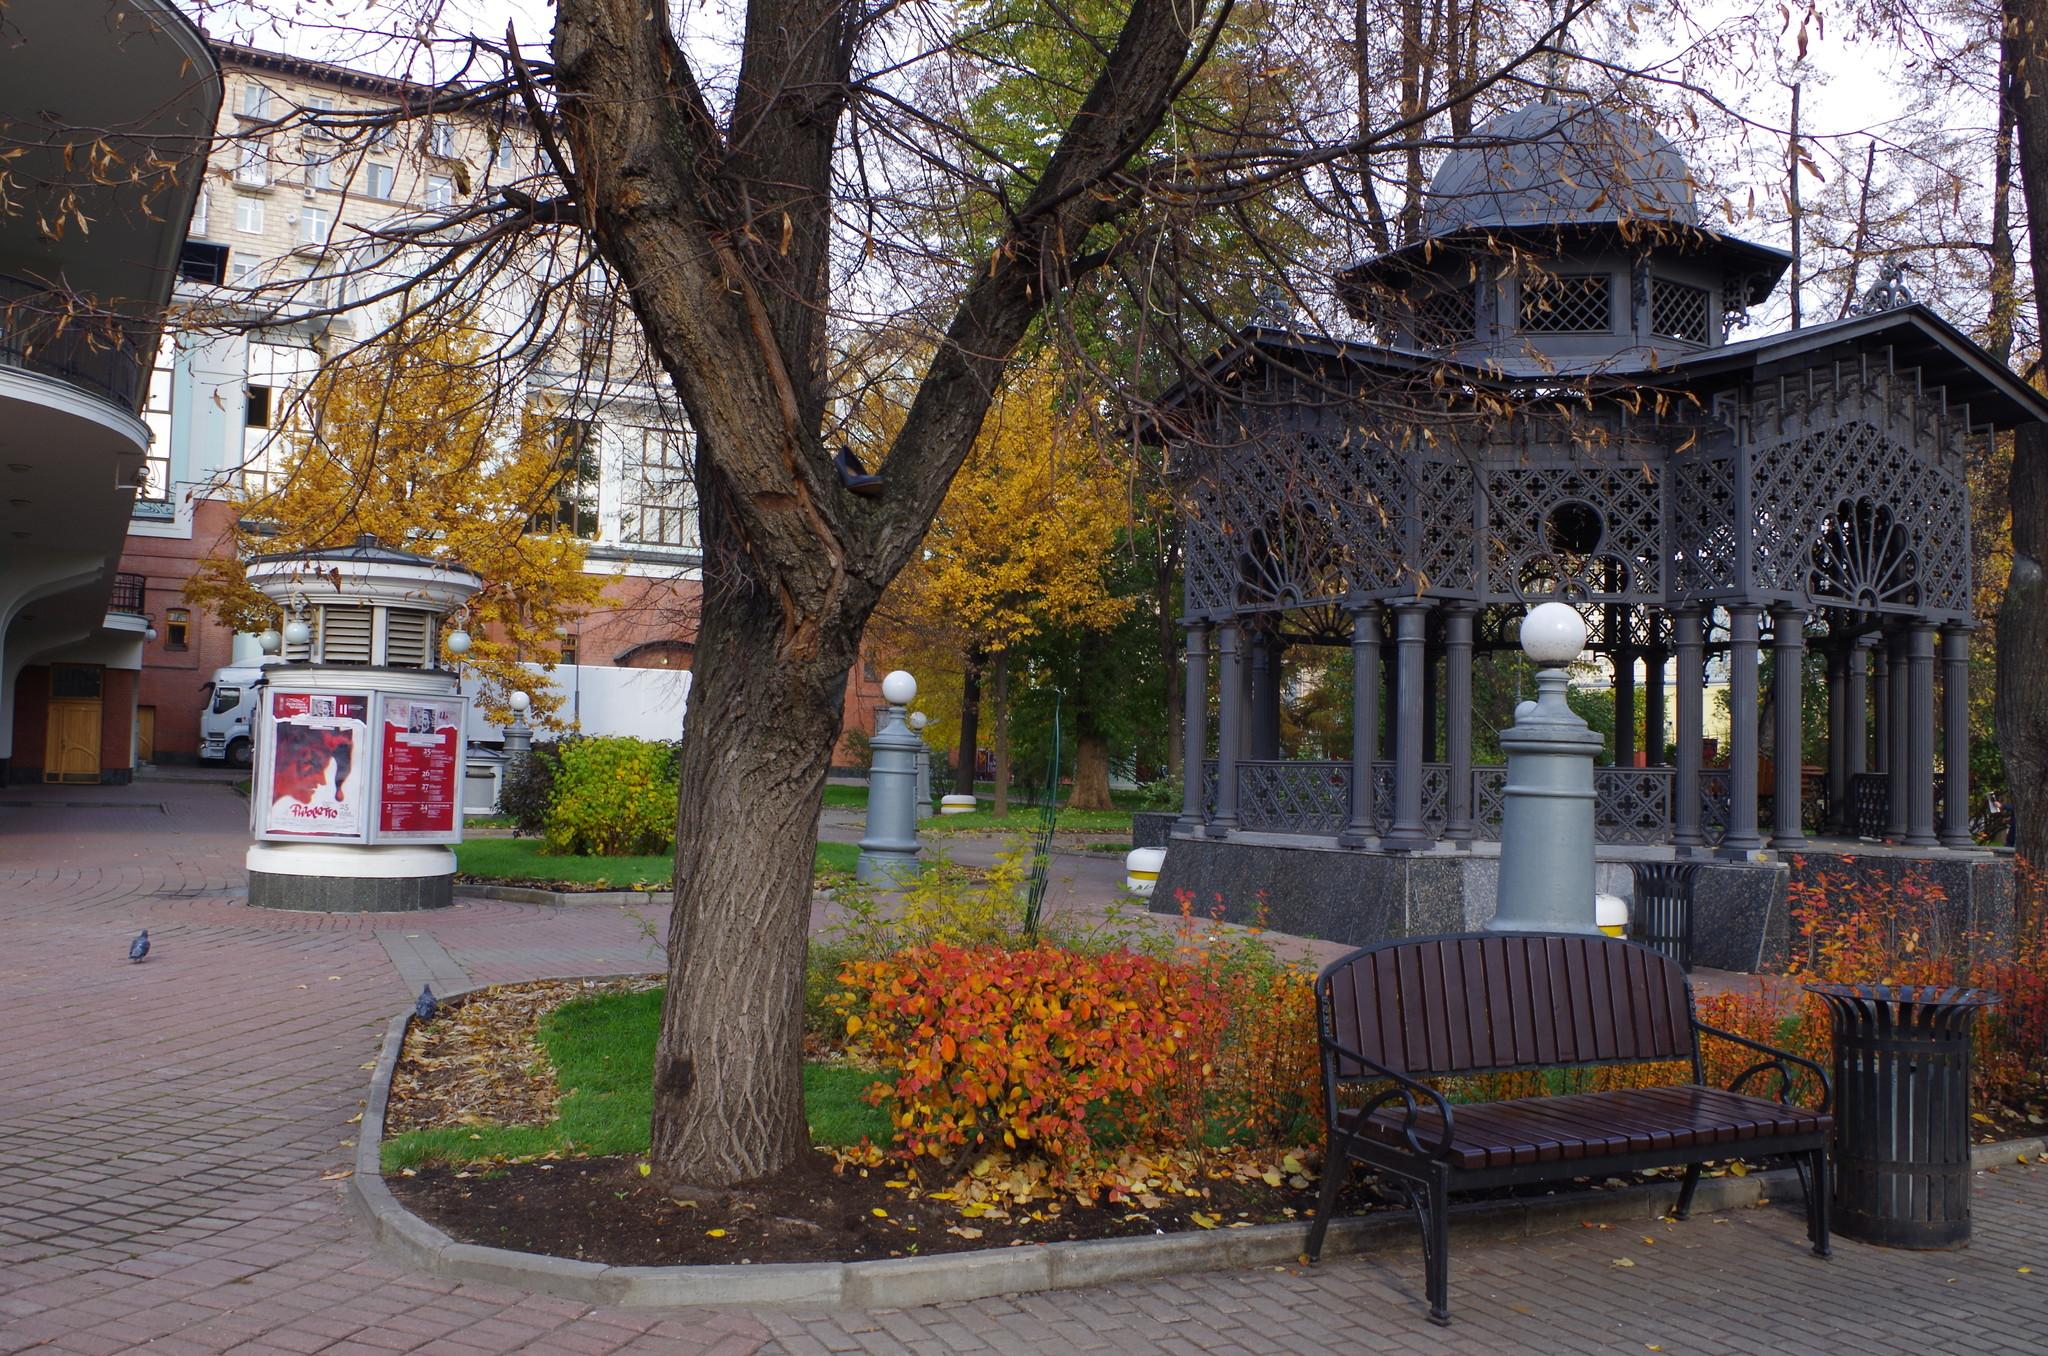 hermitage moskou